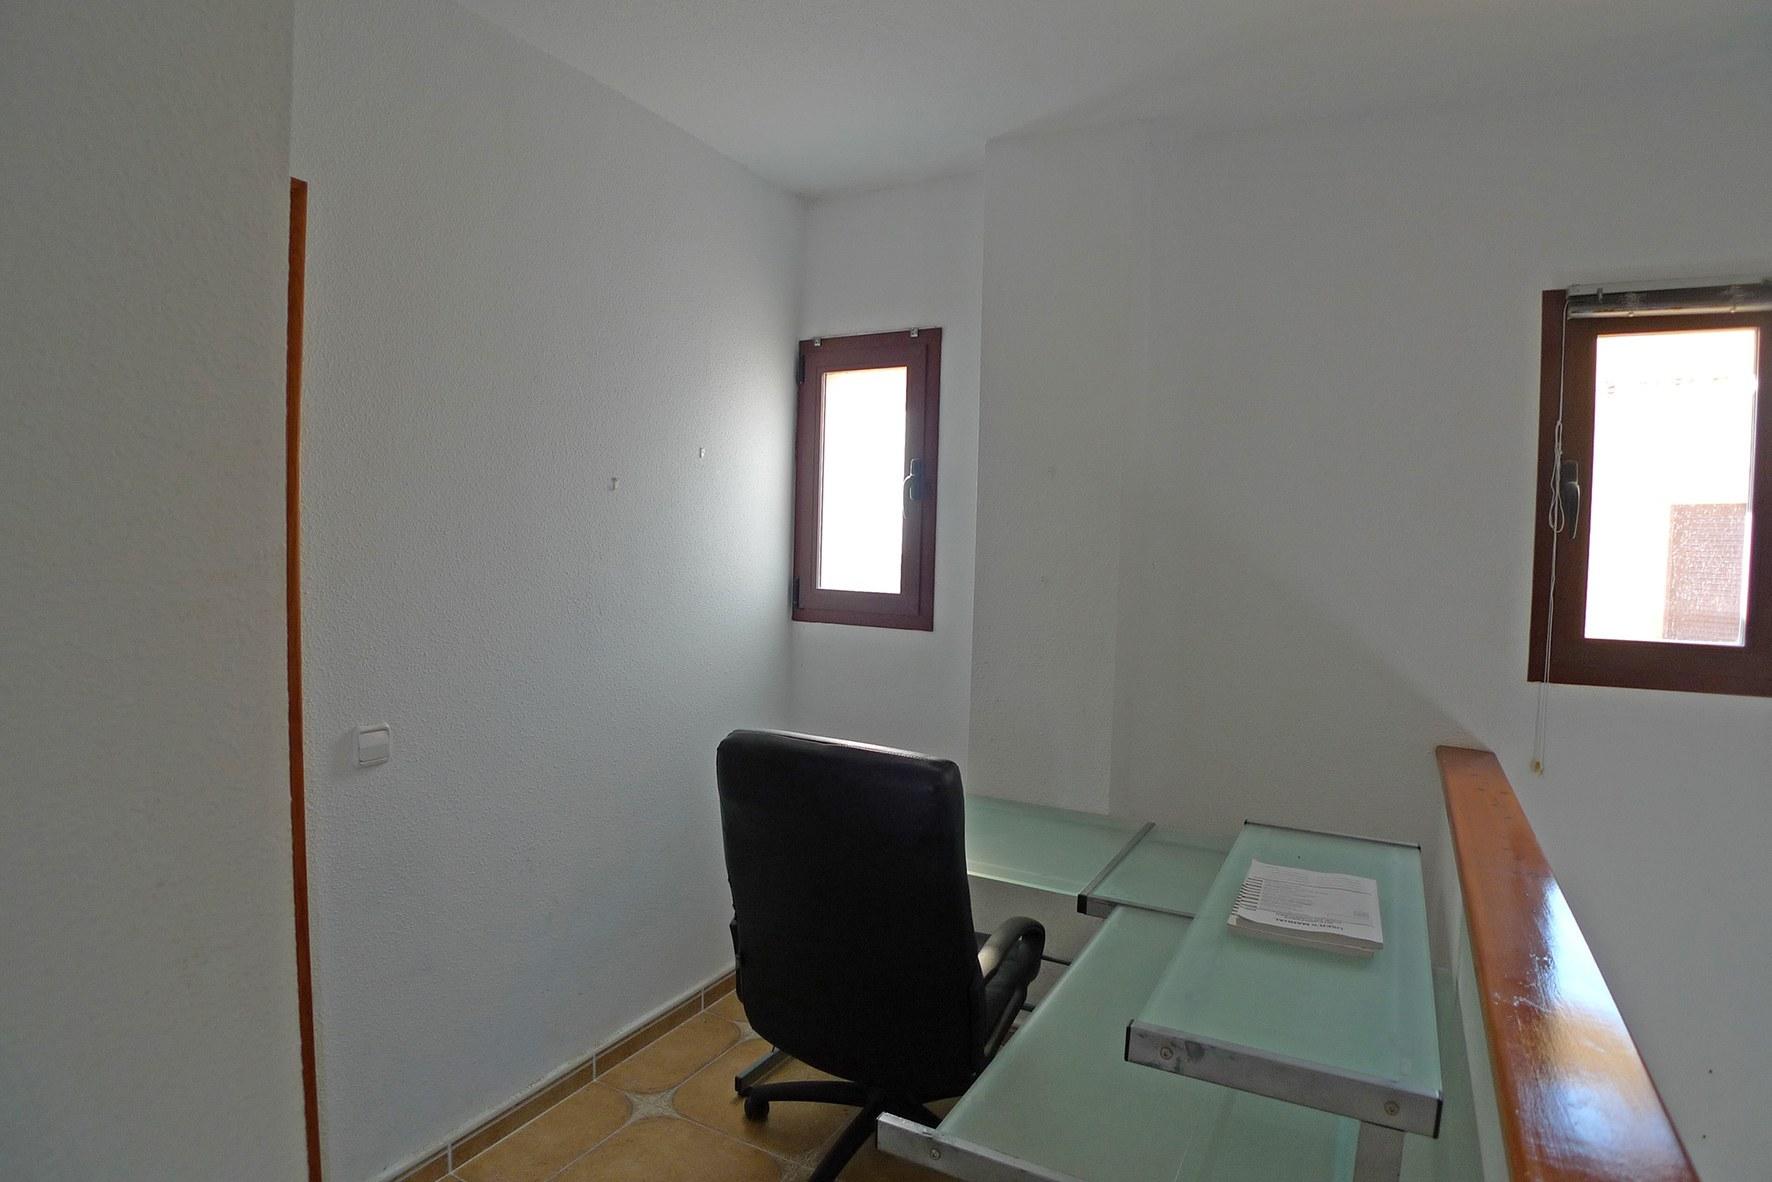 apartamentosdenialowcost-propiedades_5b8d00ede7894-source.jpg